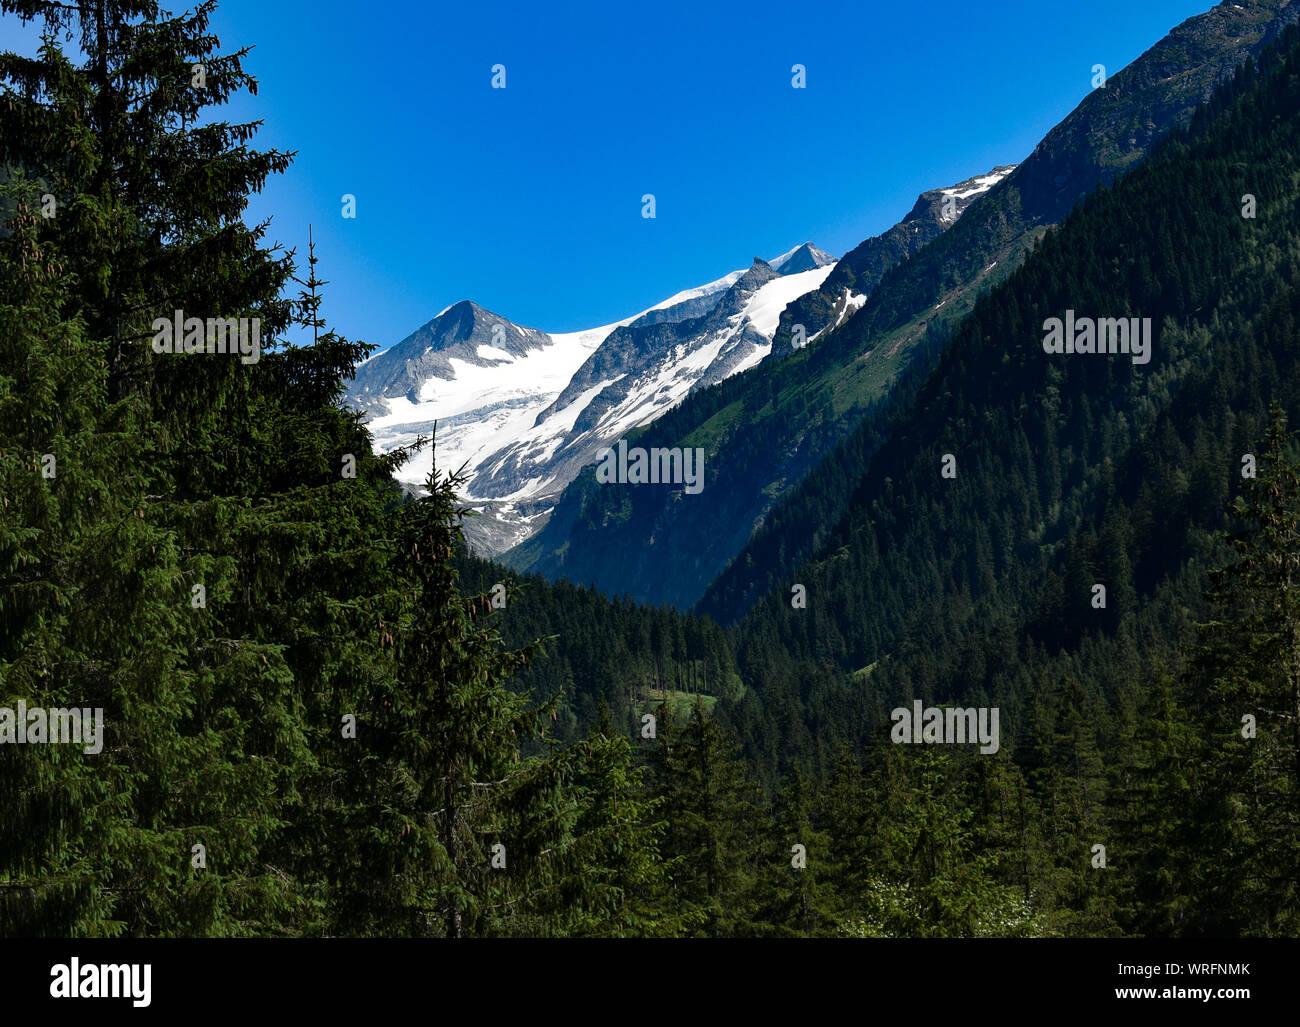 view from Untersulzbach valley towards peak of Mt. Grossvenediger at Hohe Tauern national park, Austria Stock Photo